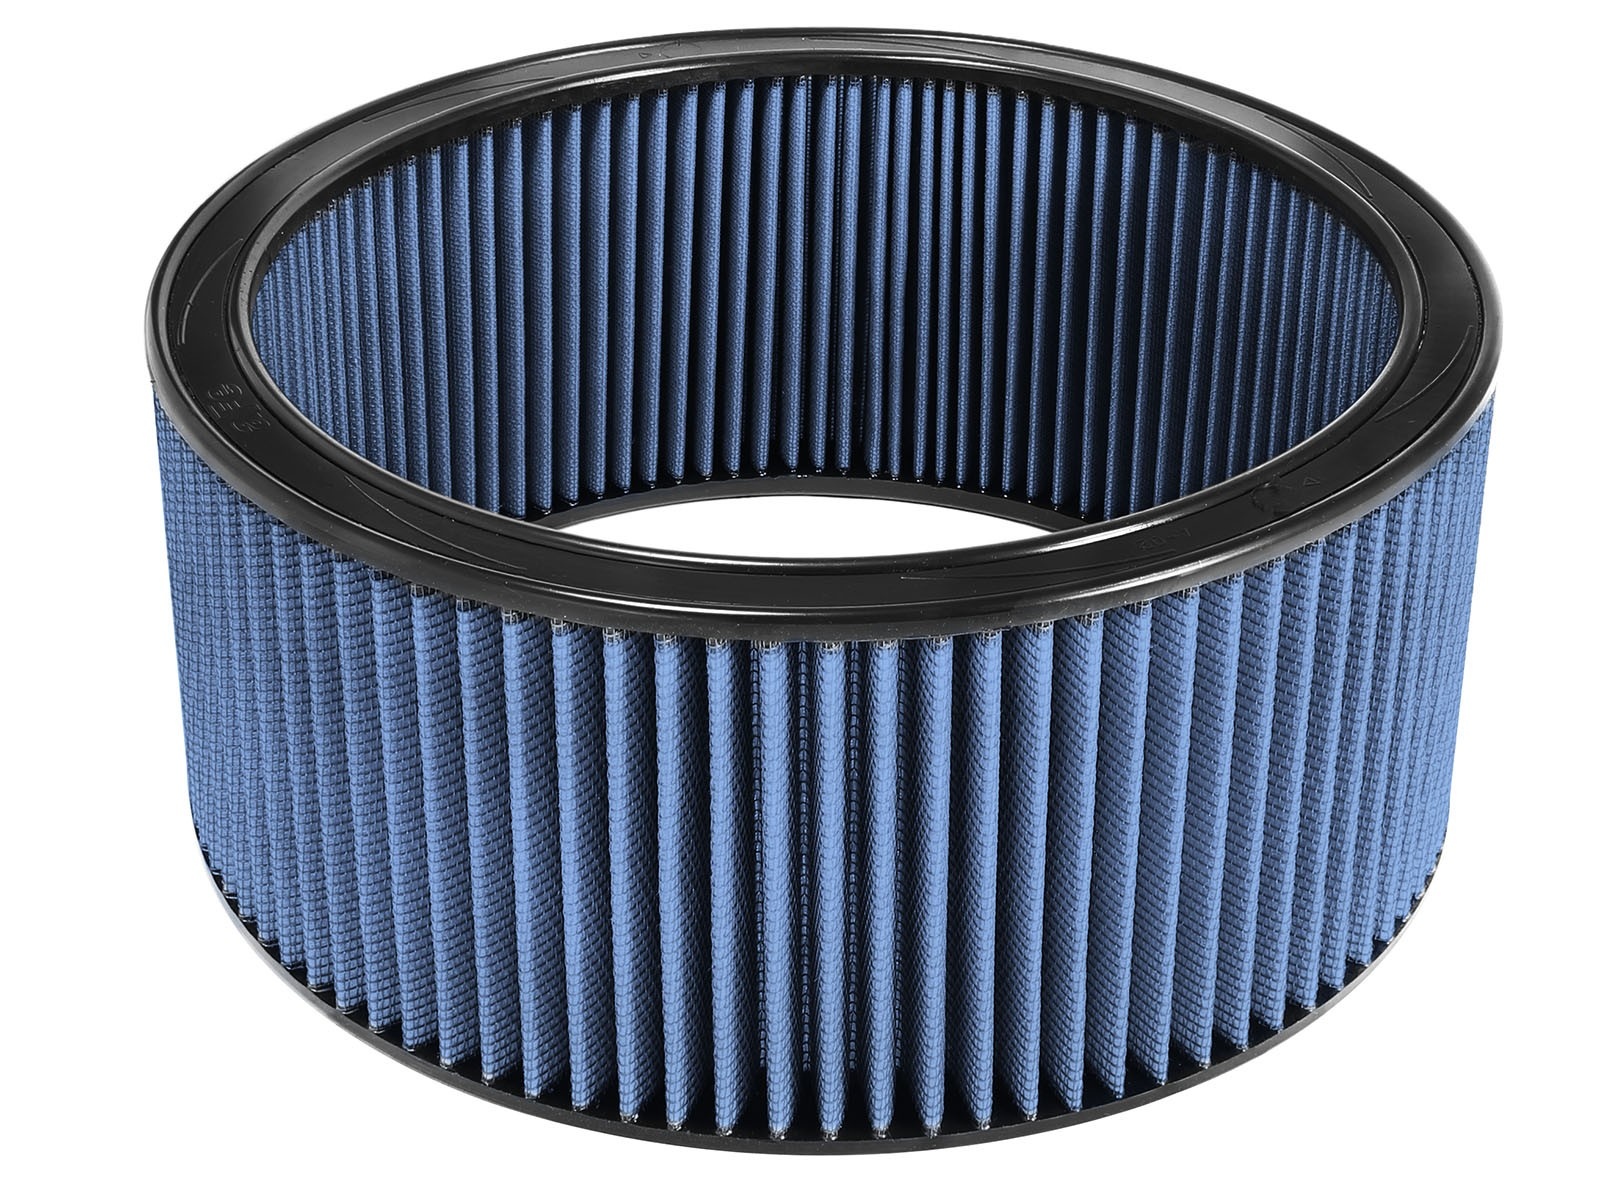 aFe POWER 10-10015 Magnum FLOW Pro 5R Air Filter